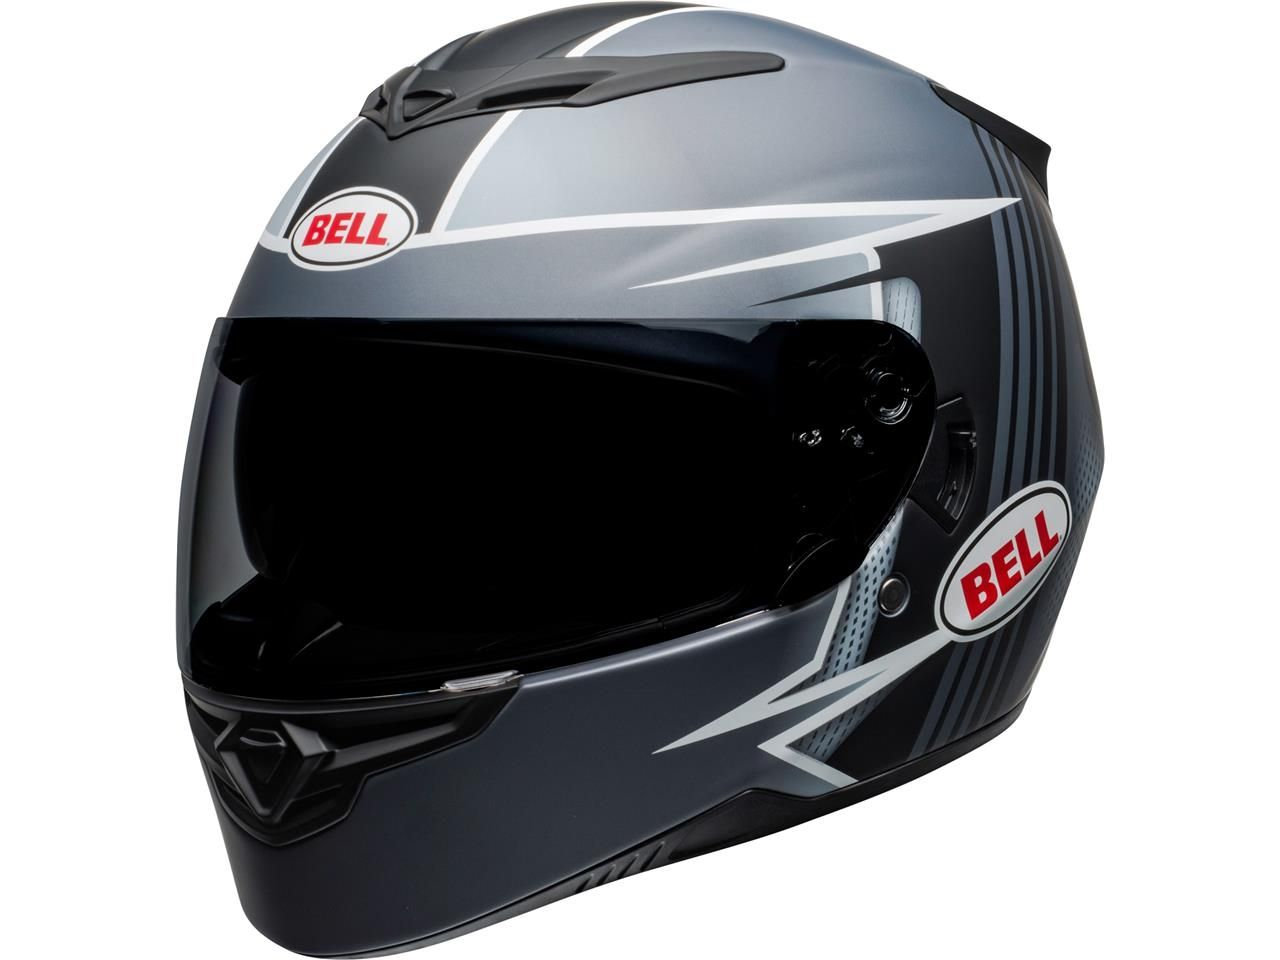 Bell RS-2 Integraalhelm Swift Black/Gray/White